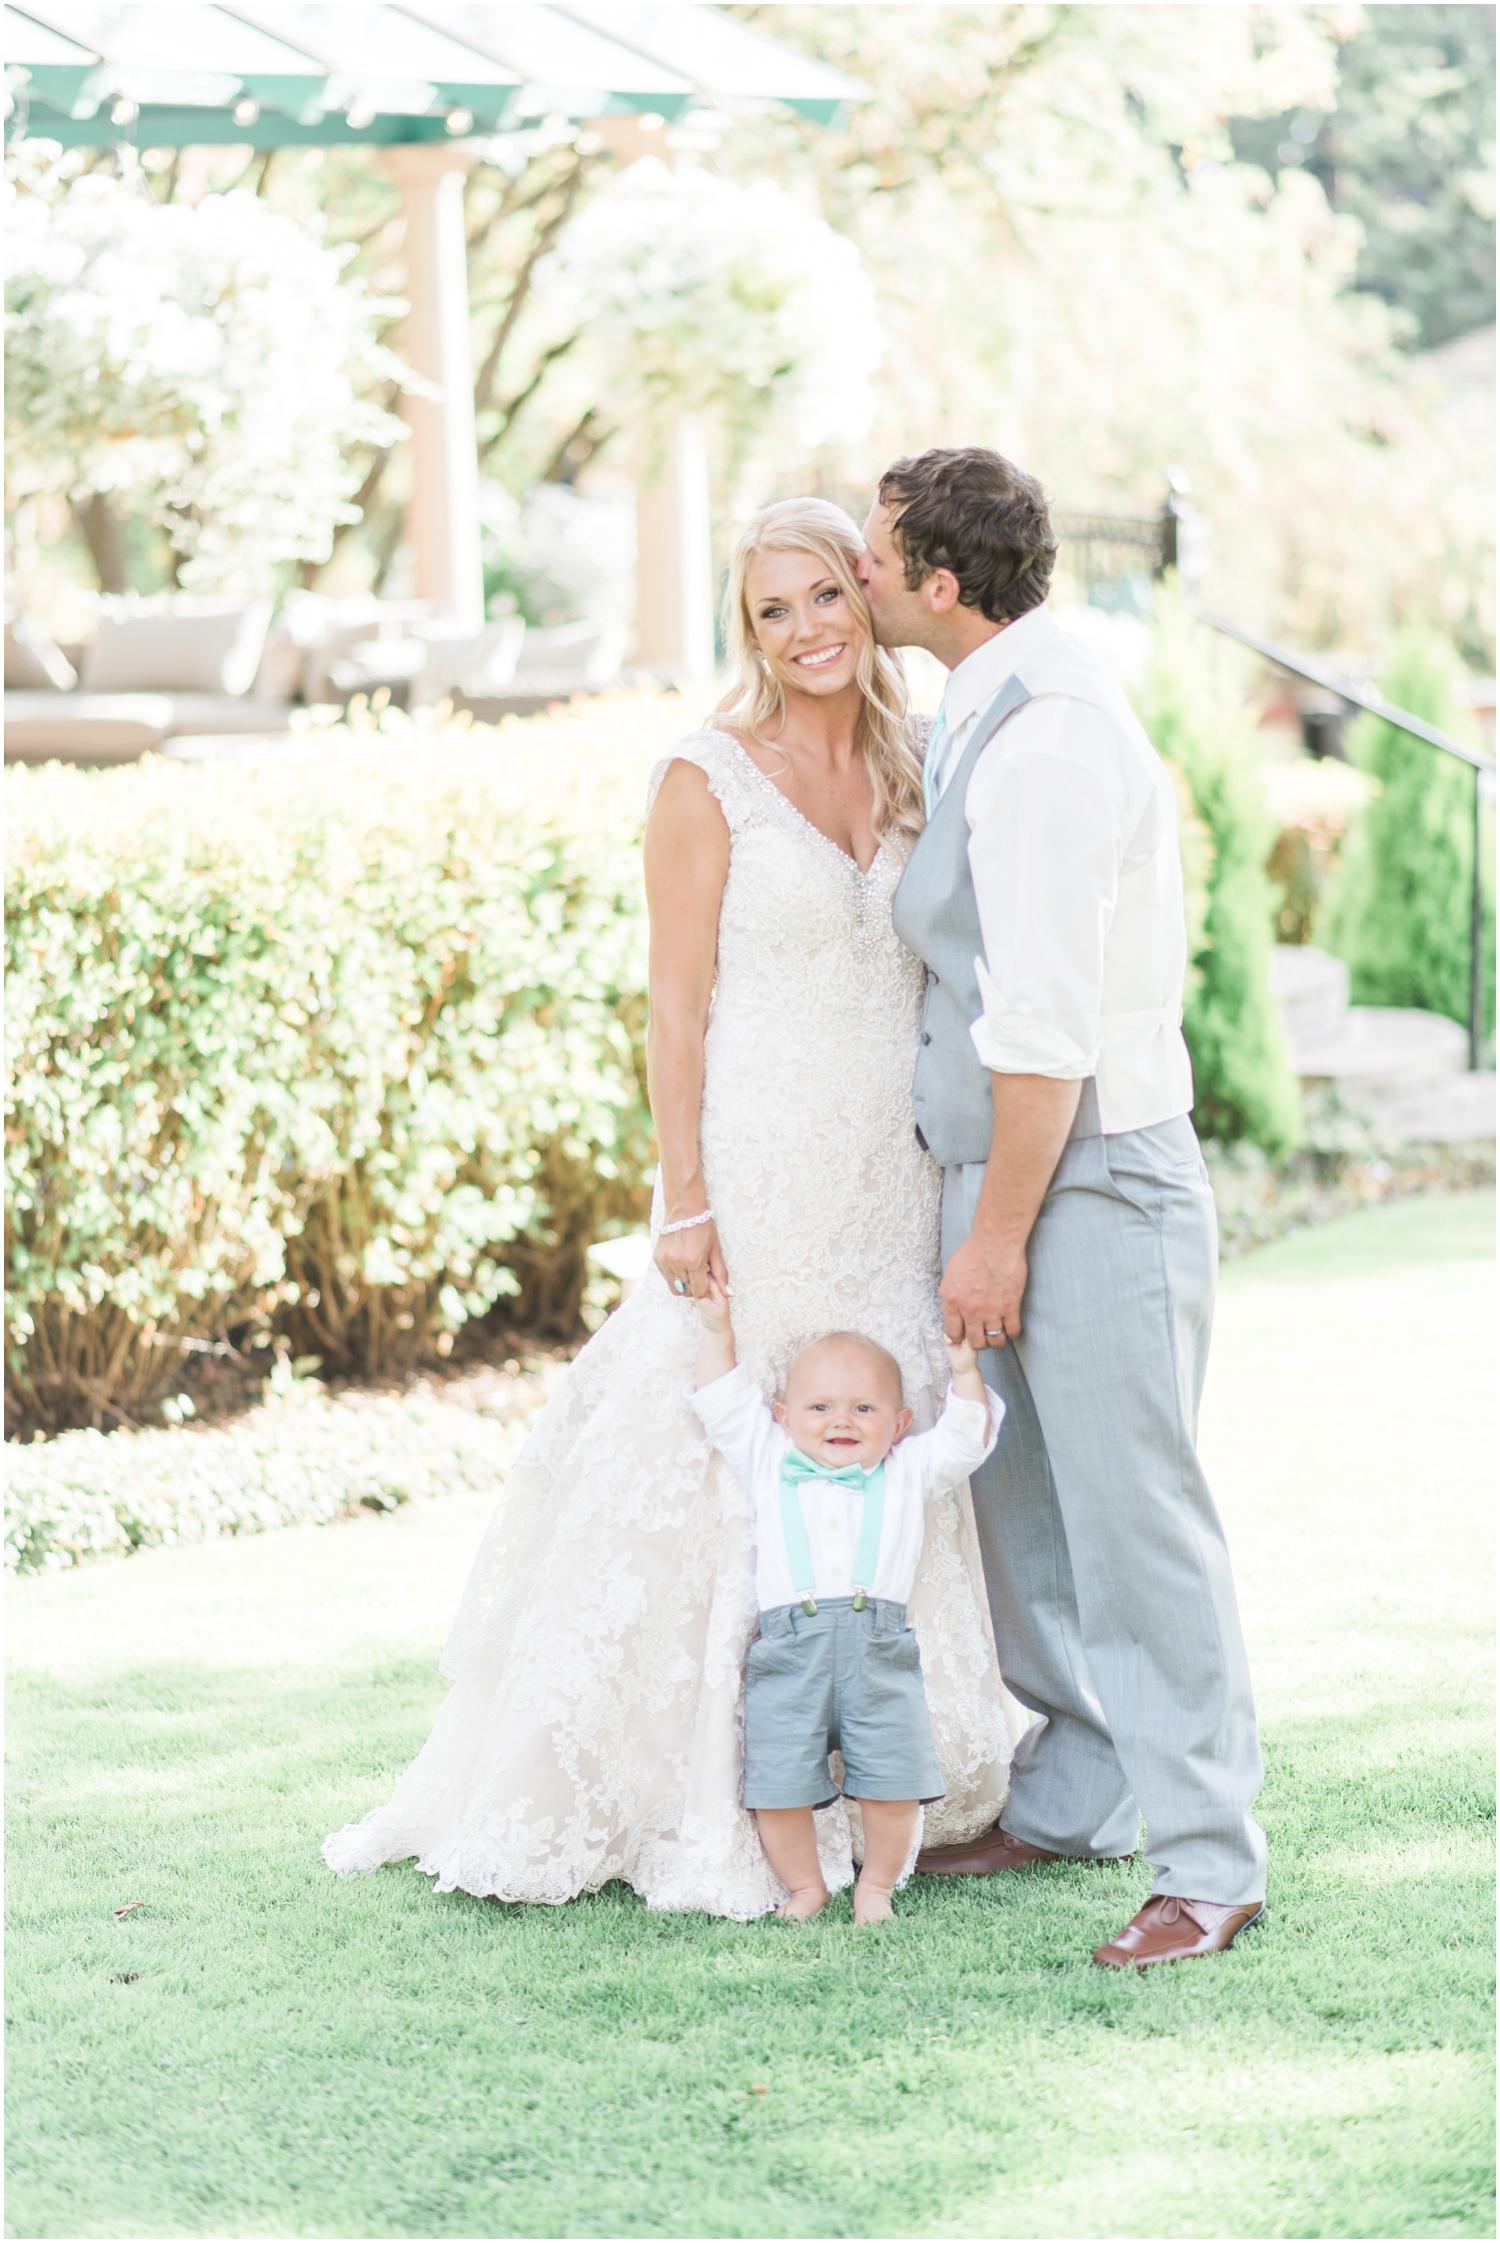 Bailey and Danes Lairmont Manor Wedding. Bellingham Weddin Photographer